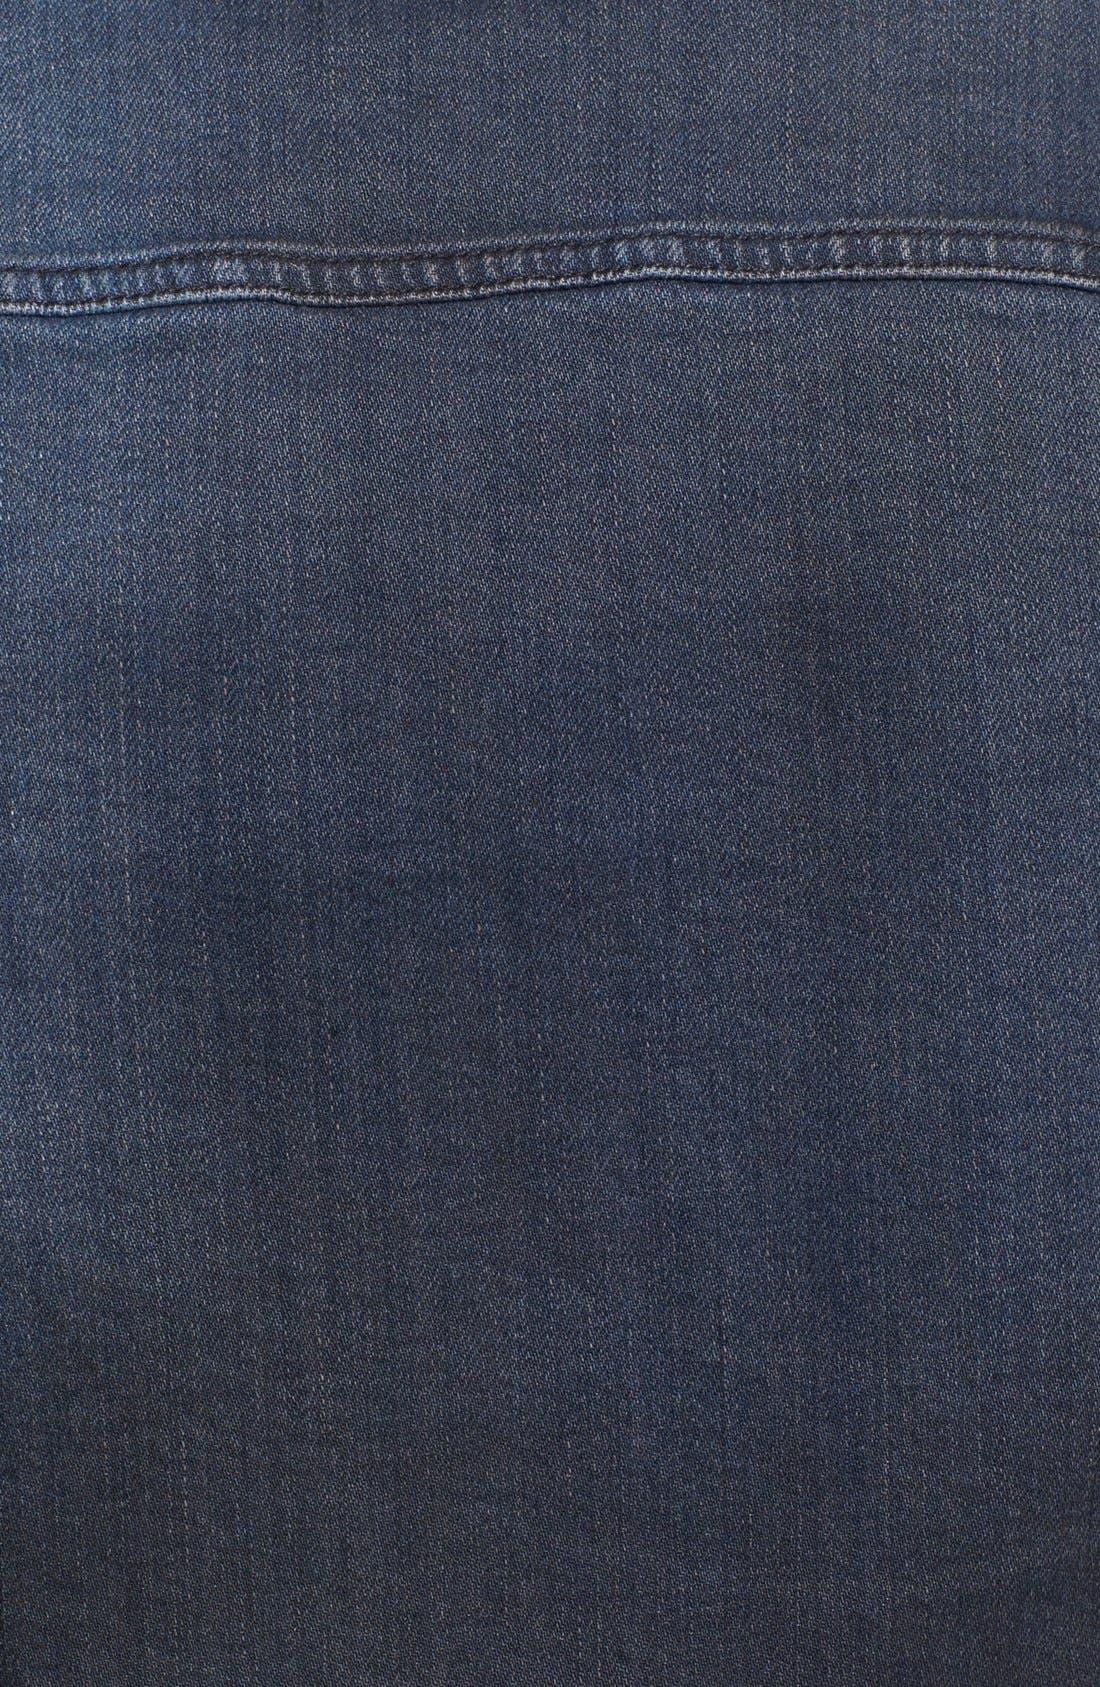 'Perry' Organic Denim Jacket,                             Alternate thumbnail 3, color,                             410